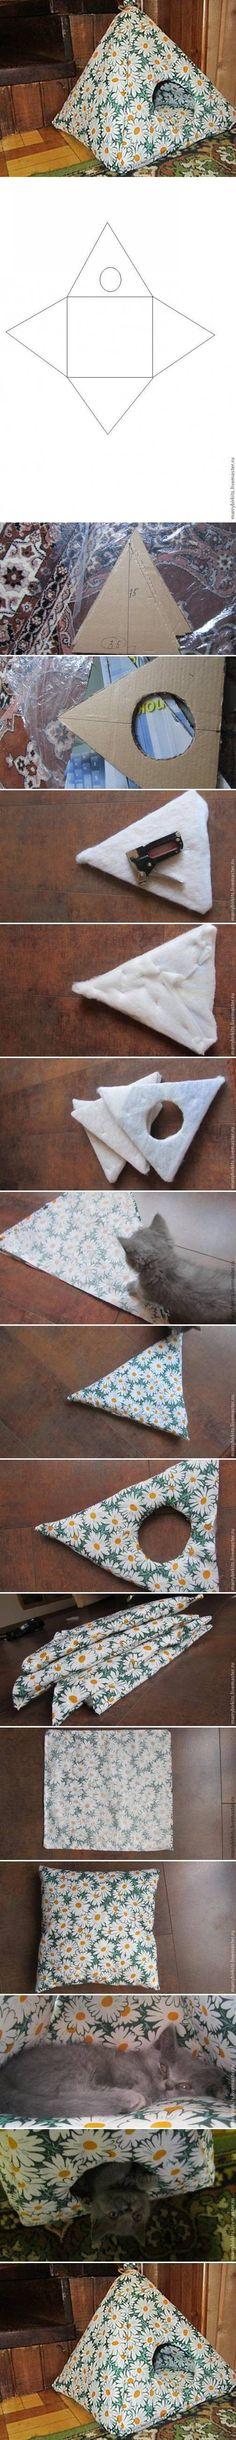 Toca para gatos fofíssima.                                                                                                                                                                                 Más